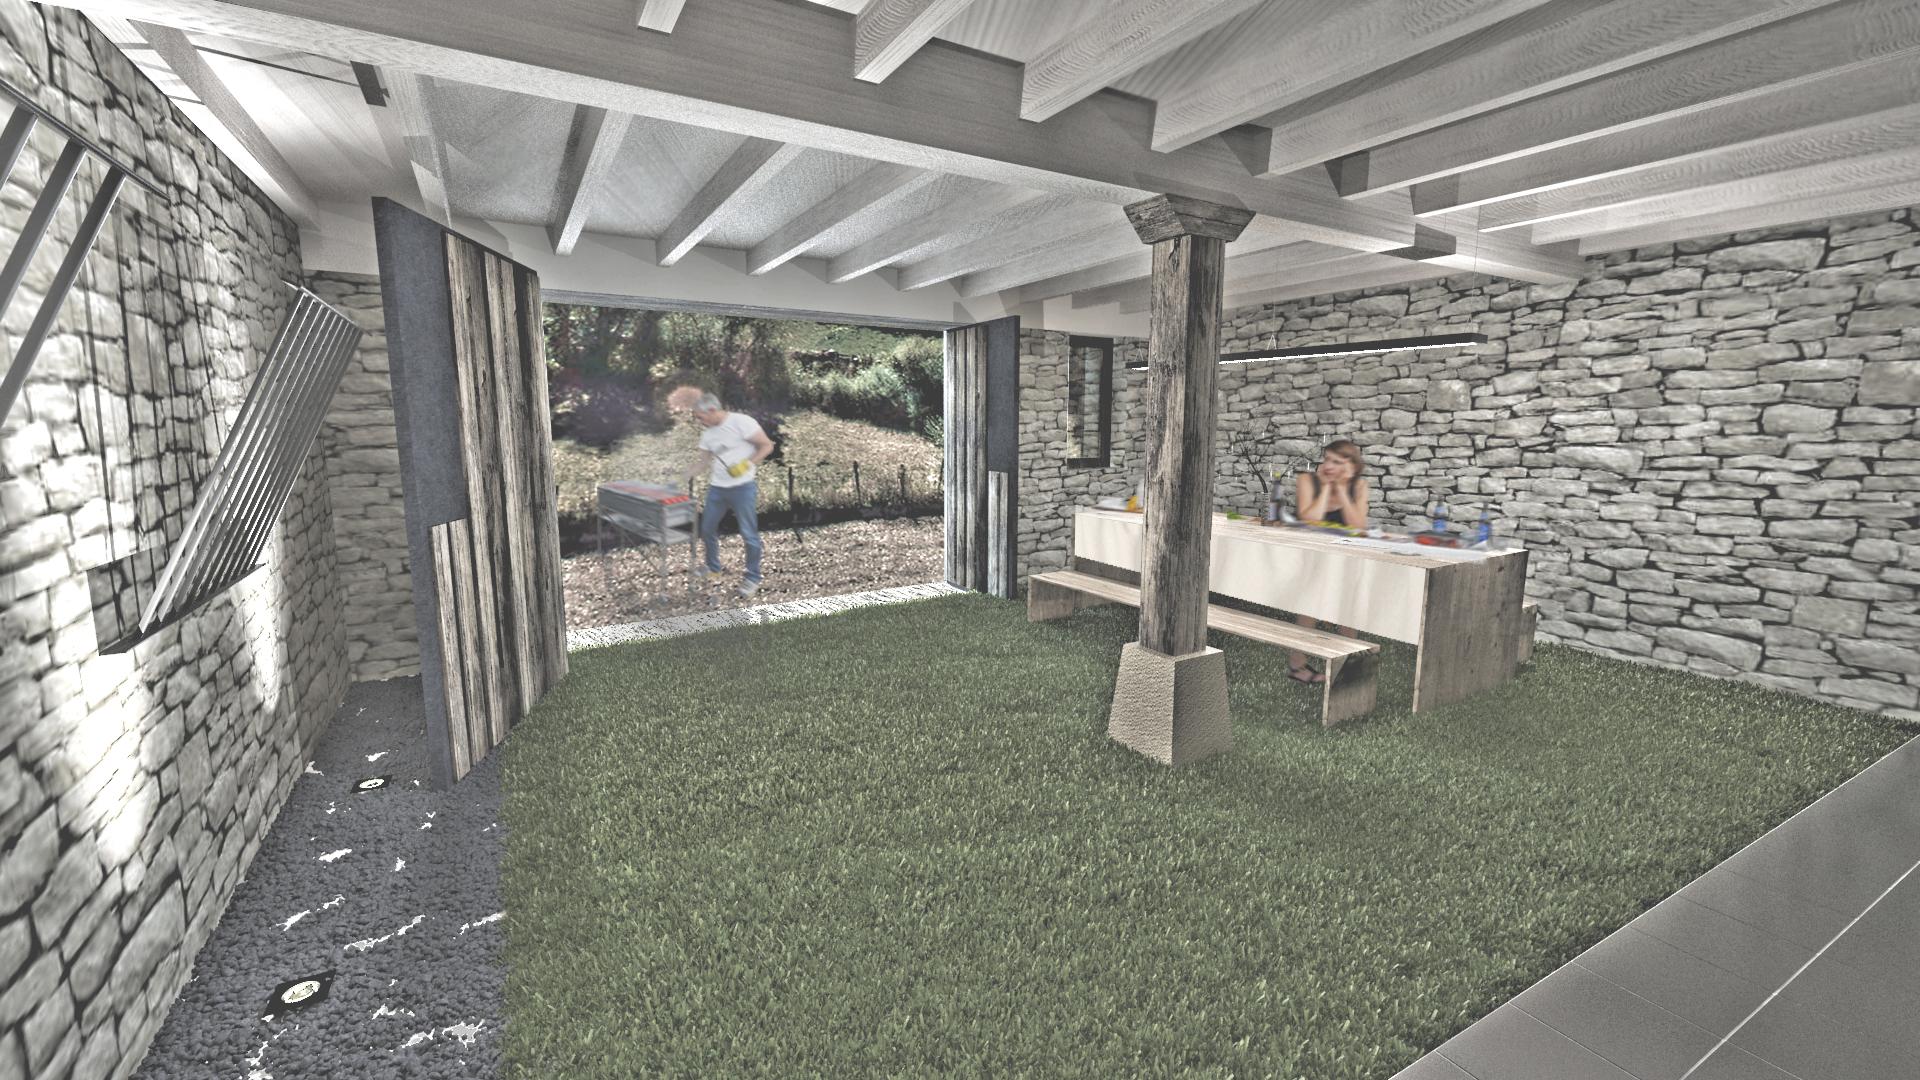 sietequince proyecto vivienda rural diseño pb patio interior